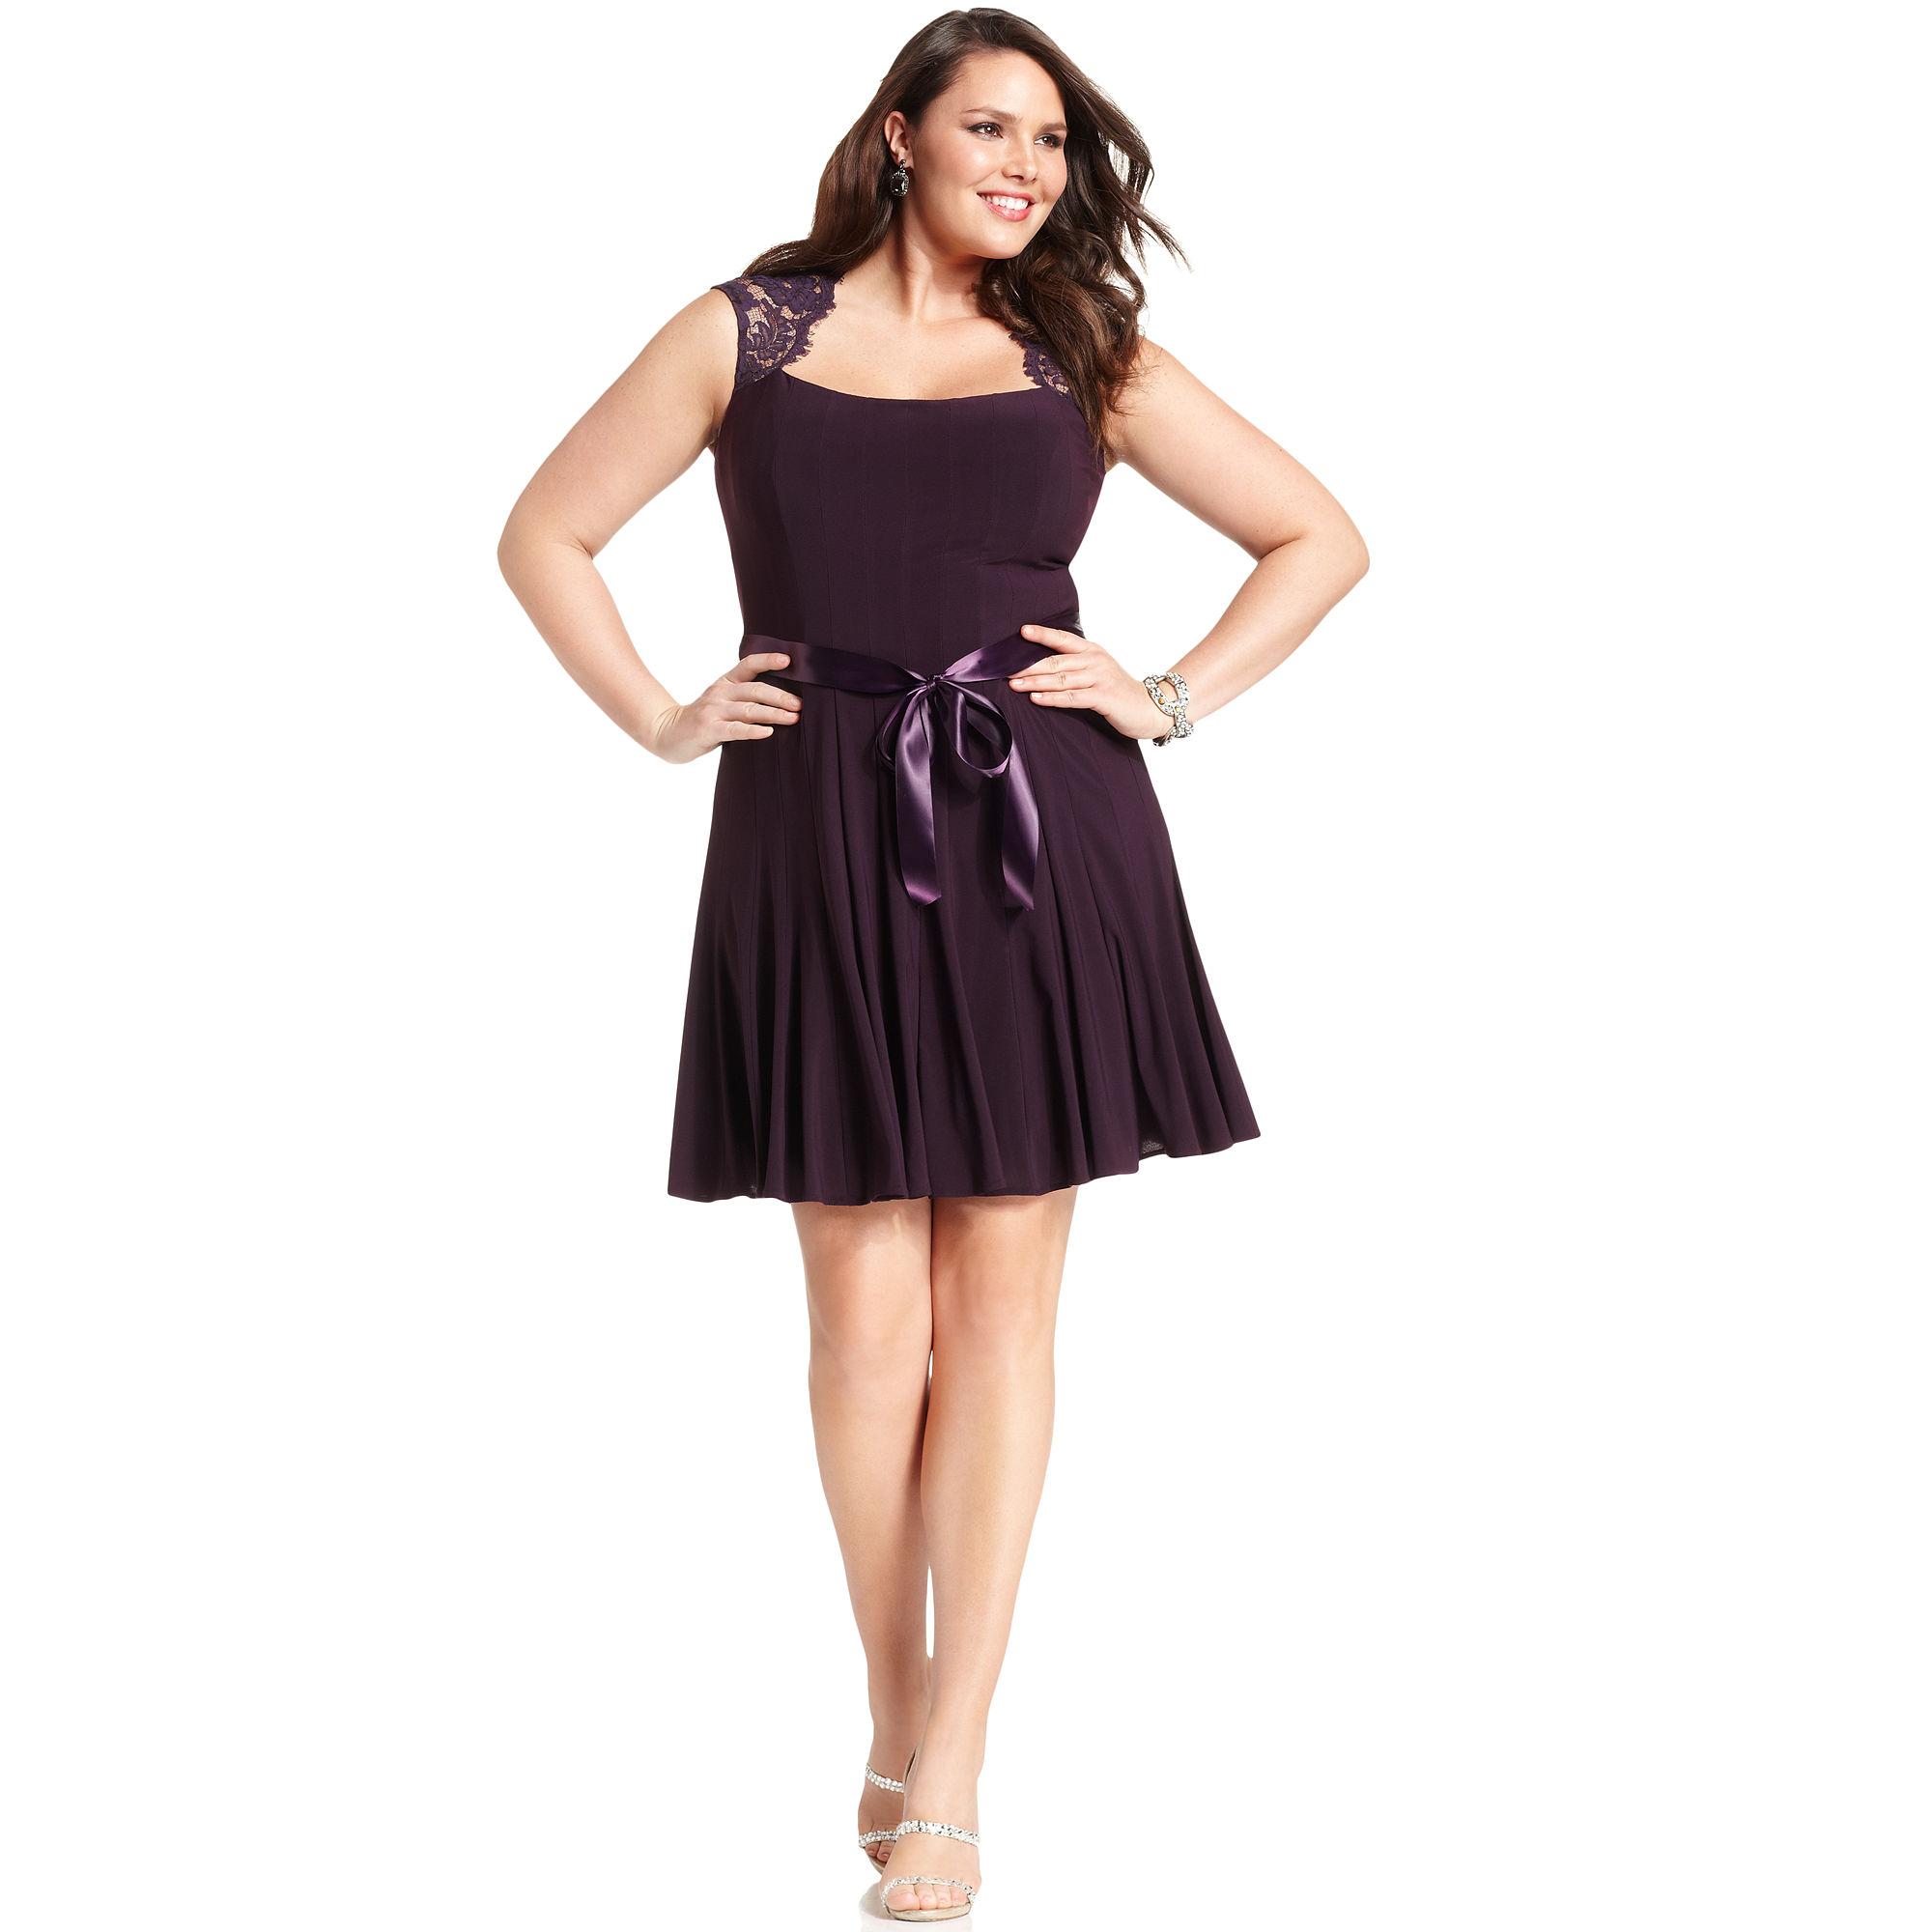 Xscape Xscape Plus Size Dress Capsleeve Lace Seamed in Purple Plum  Lyst